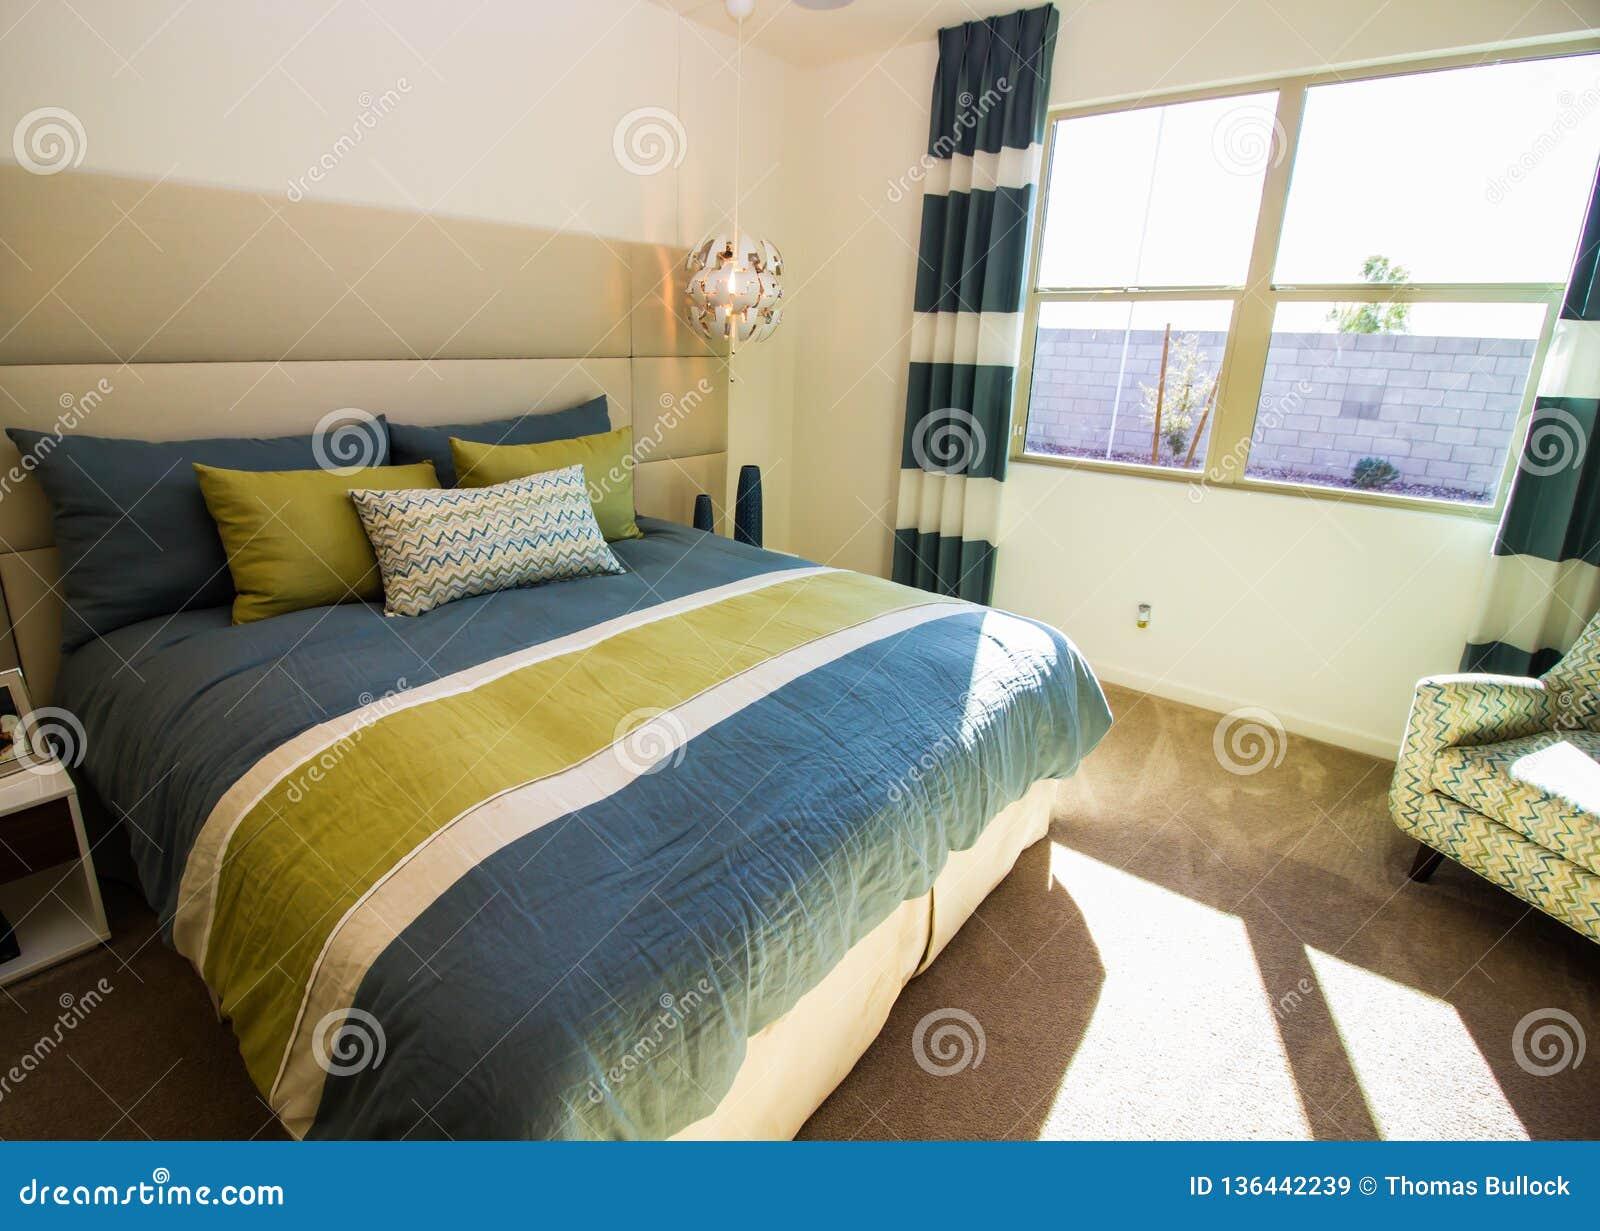 Sensational Modern Bedroom With Chair And Sunshine Stock Image Image Spiritservingveterans Wood Chair Design Ideas Spiritservingveteransorg